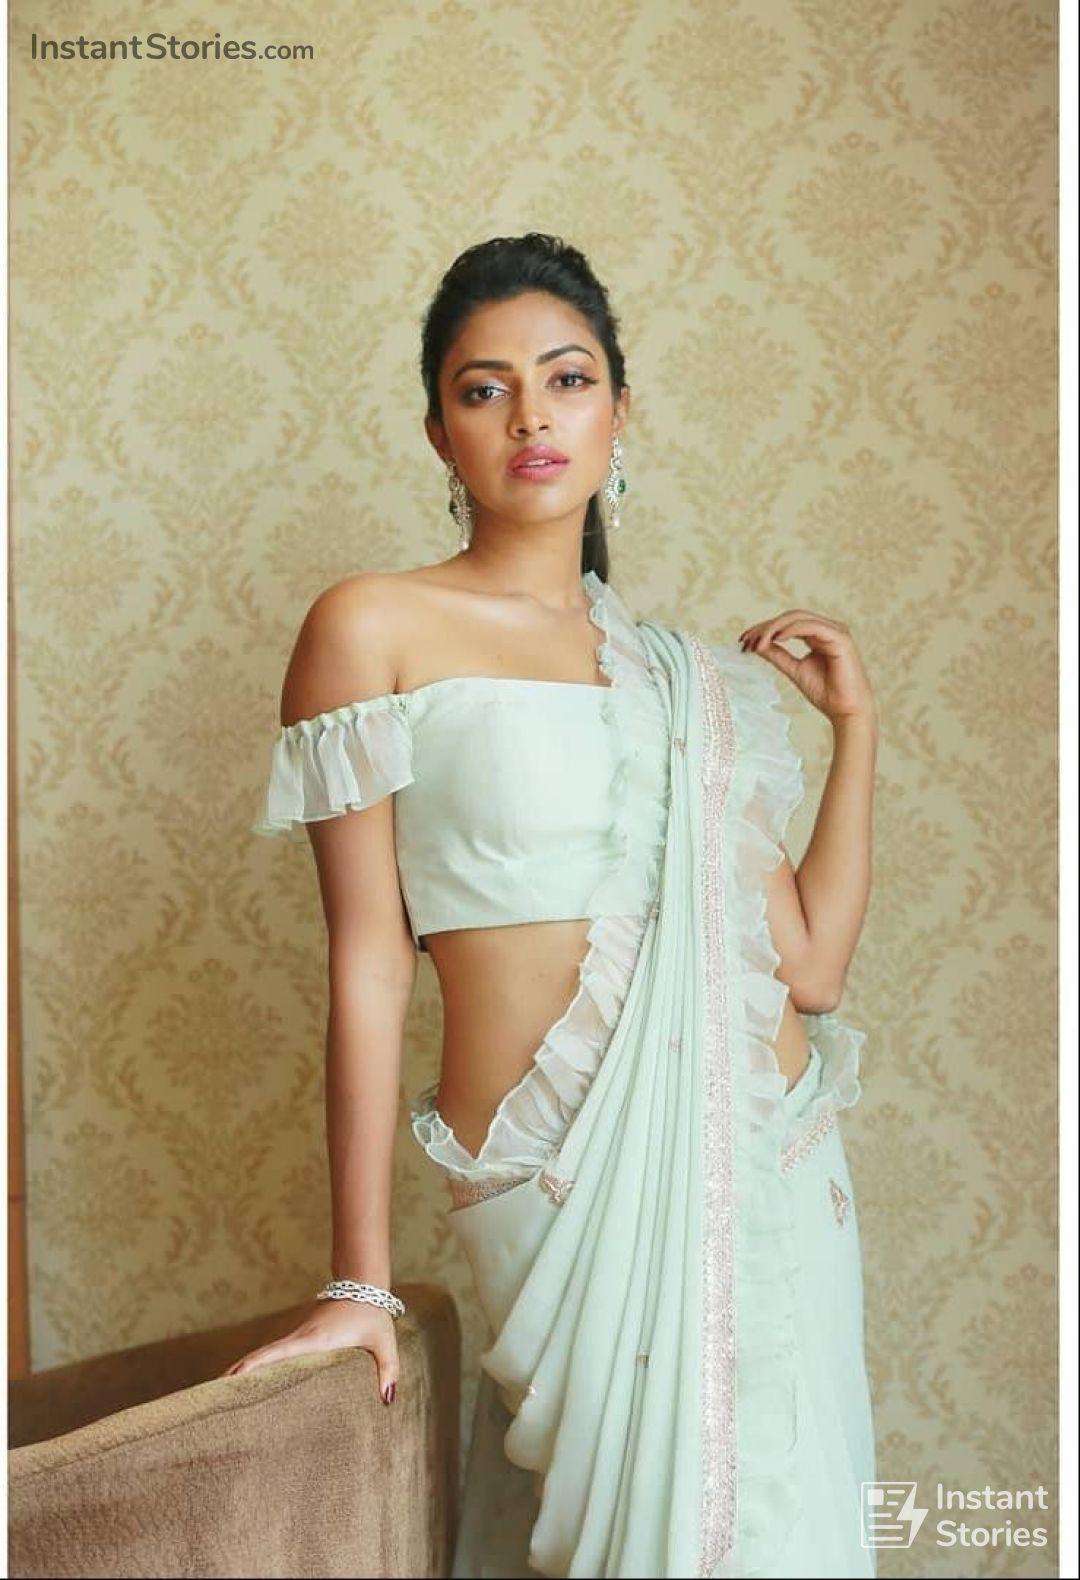 Tamil Actress Neelam Hot Photos | Latest Hot Sexy Pics